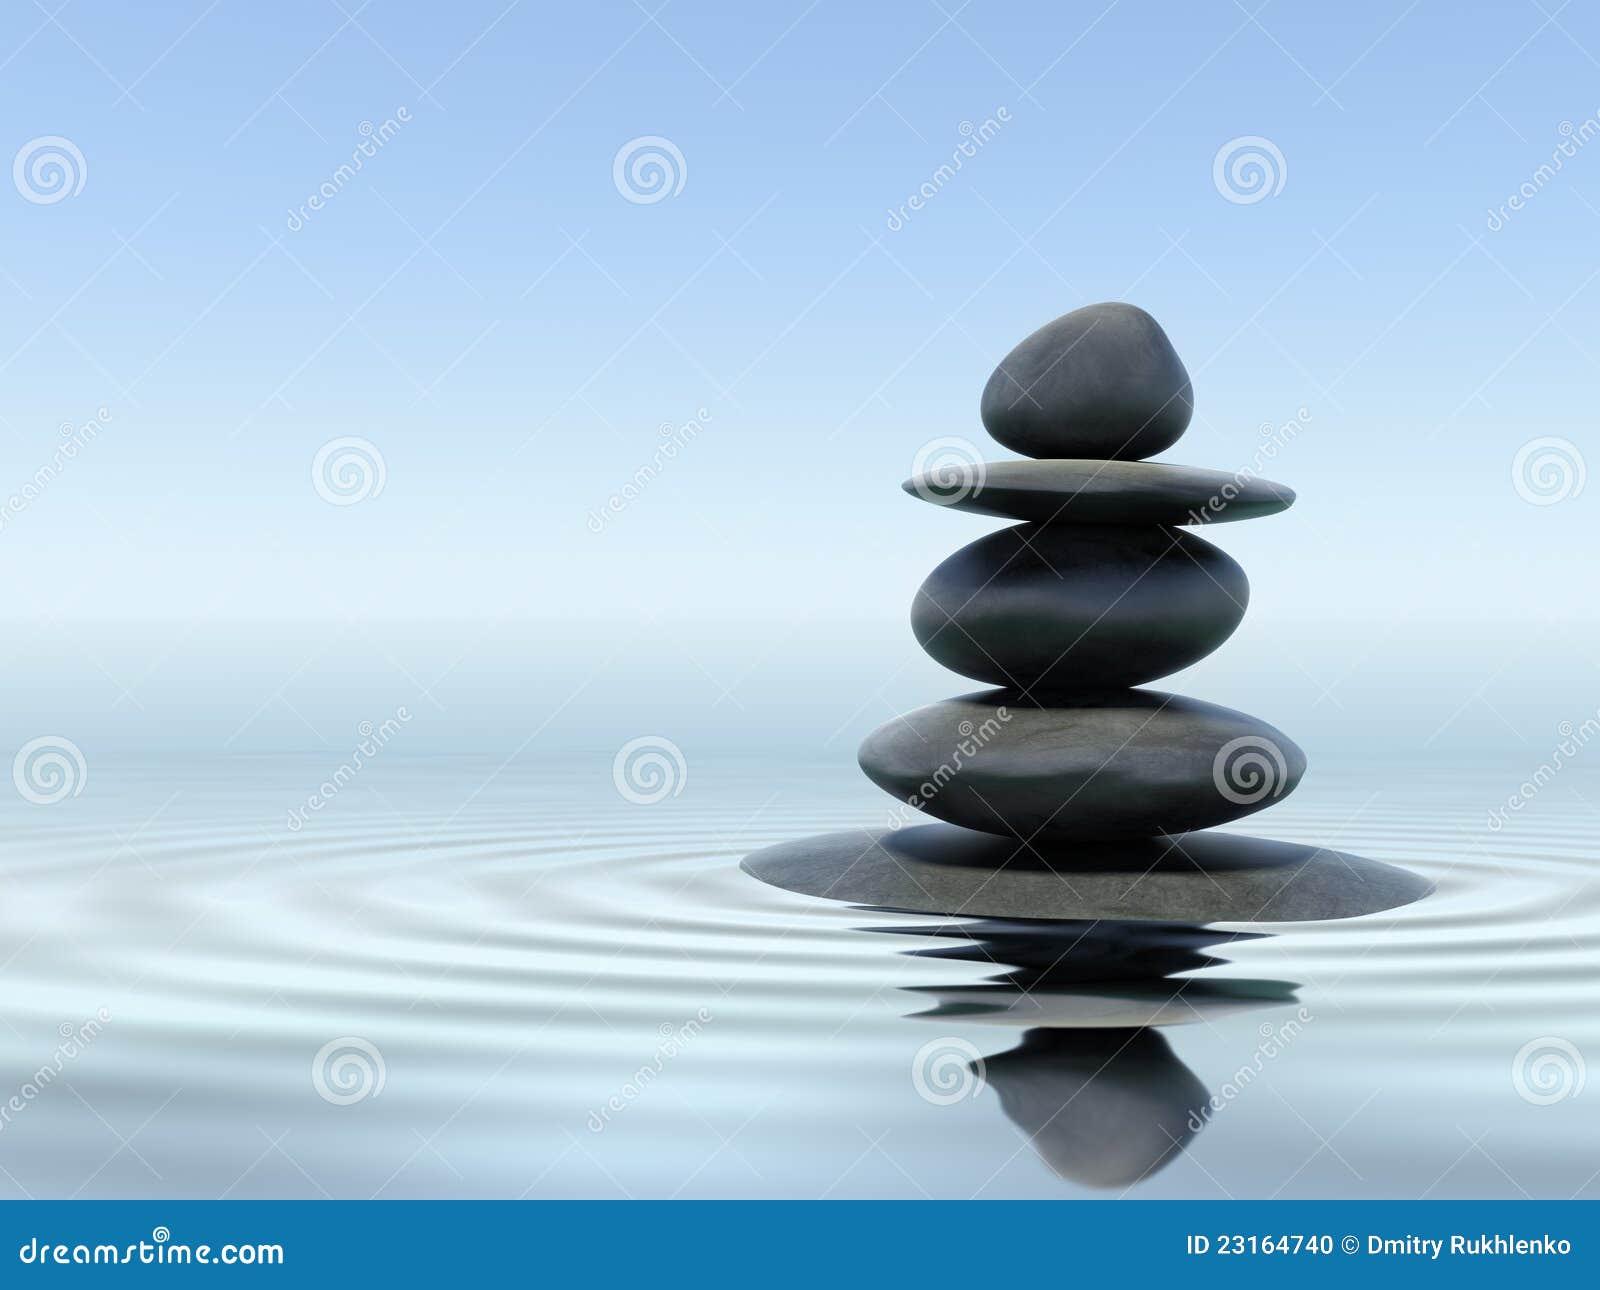 Download Zen stones stock photo. Image of meditation, meditative - 23164740